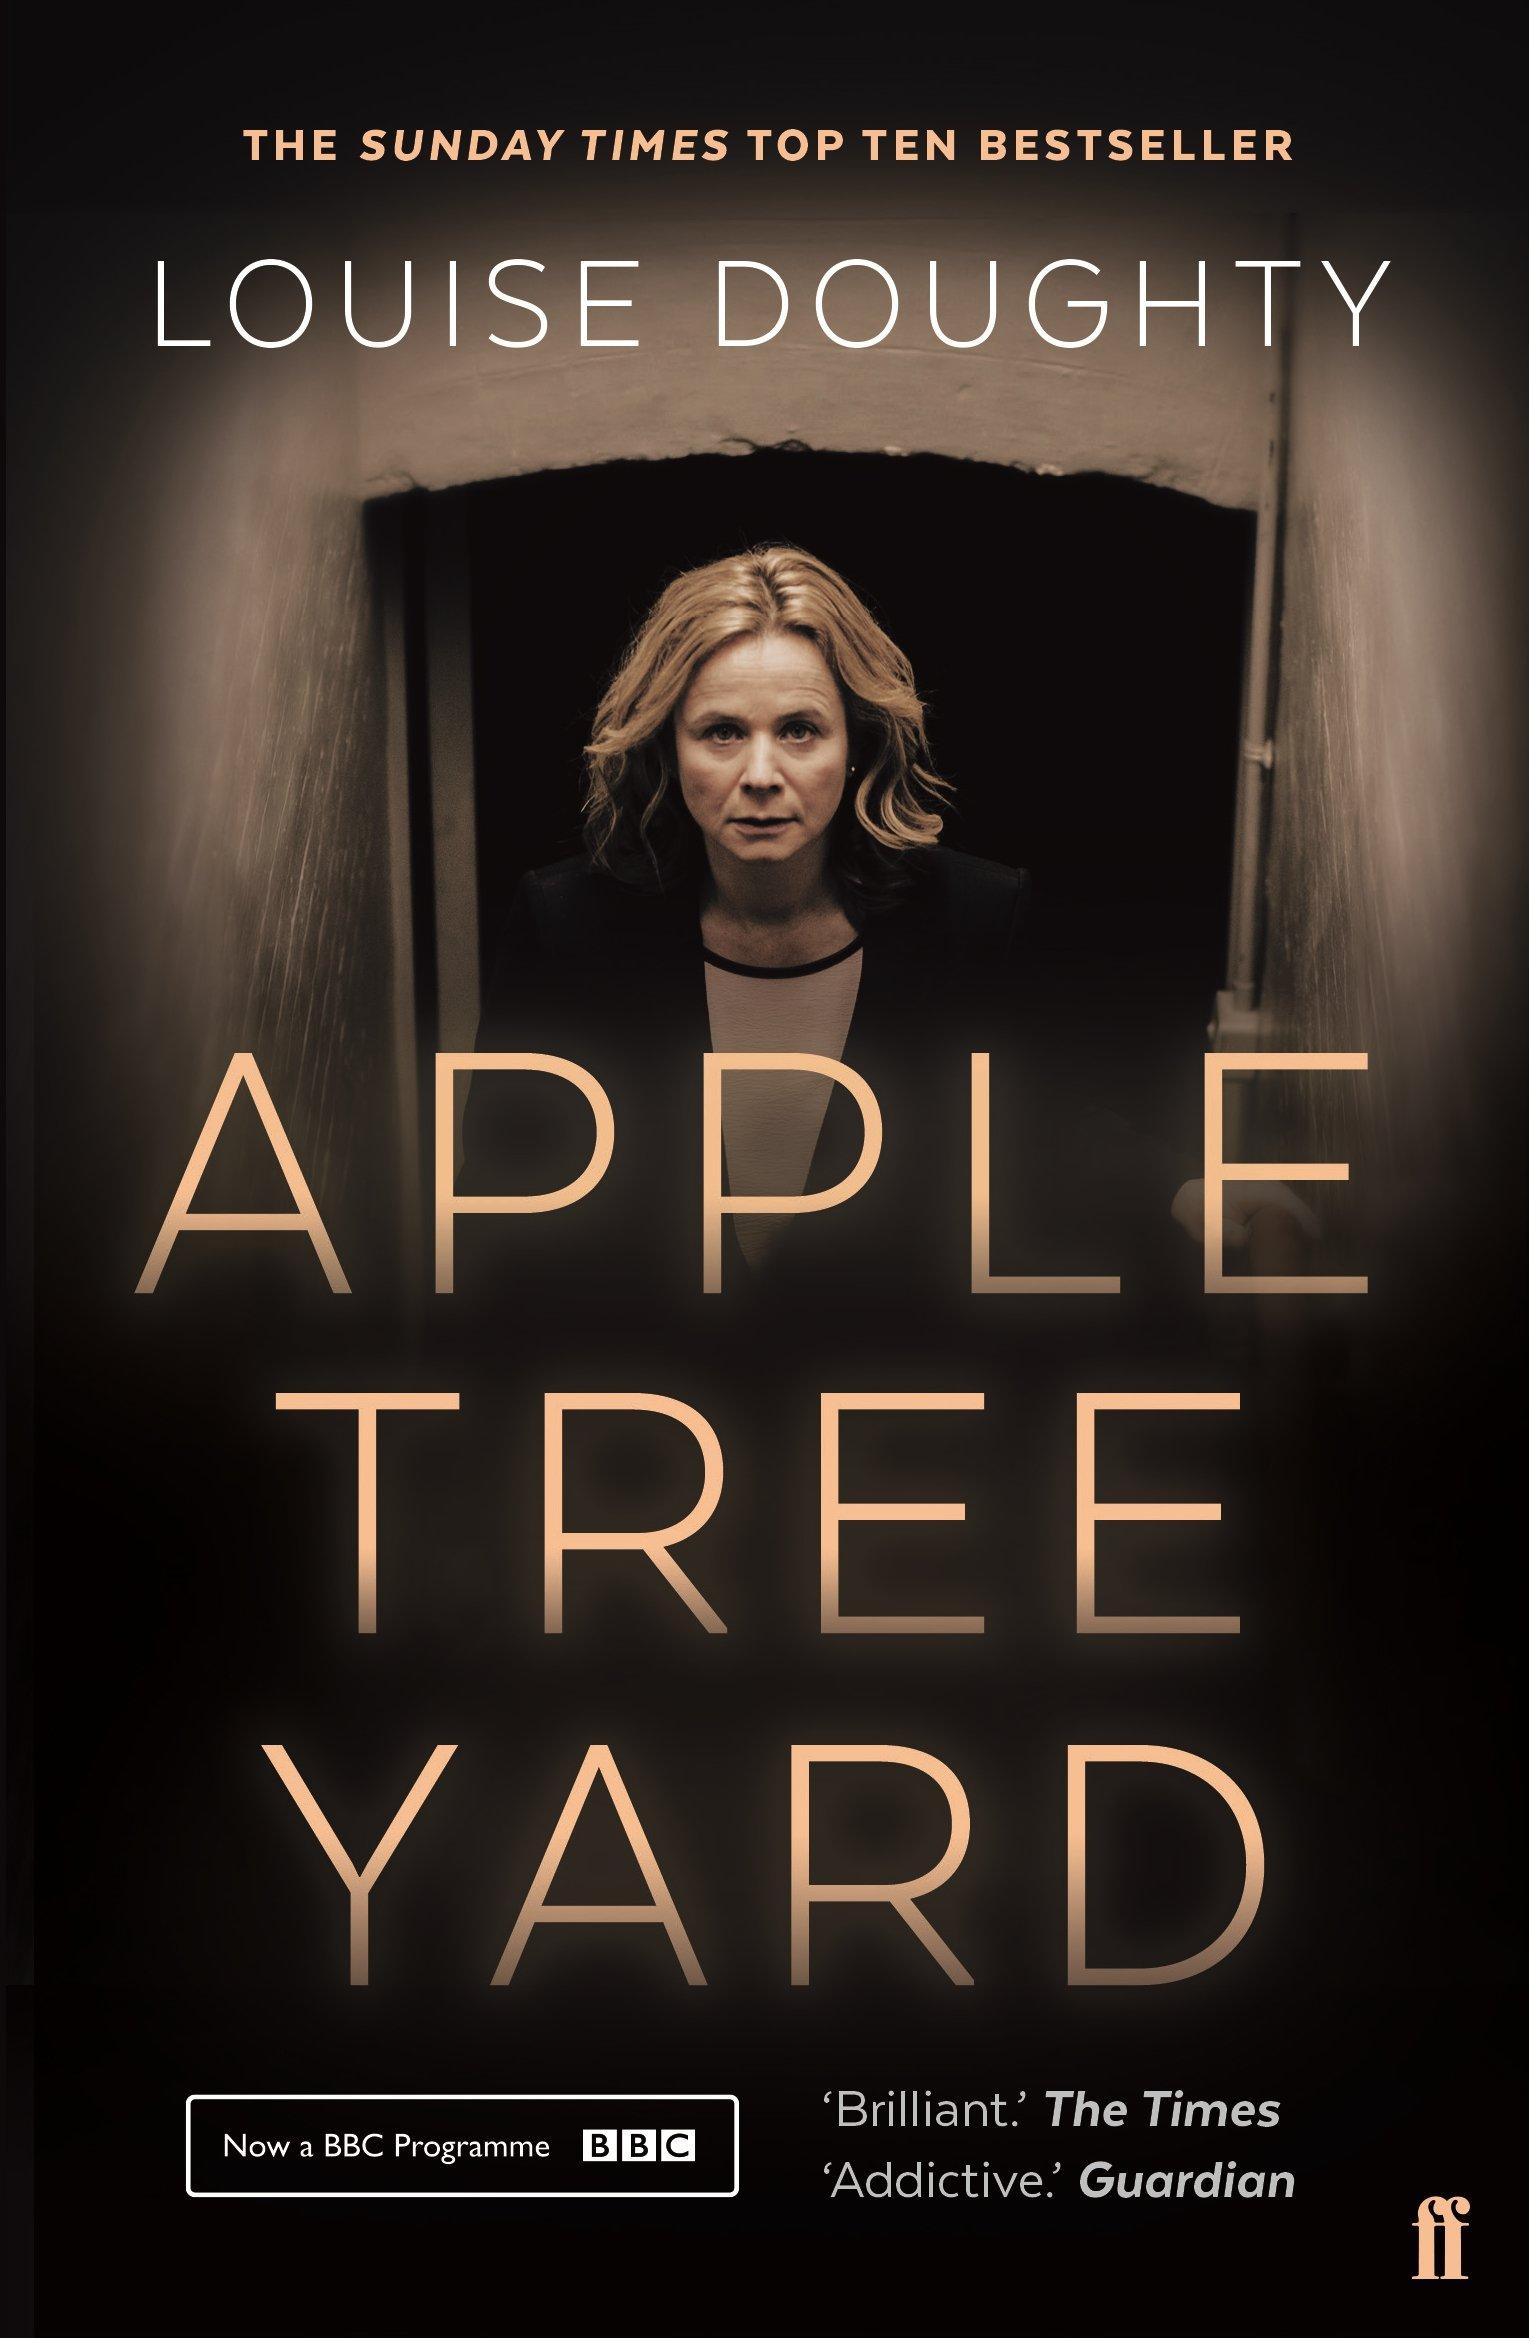 Apple.Tree.Yard.S01E03.iNTERNAL.SPANiSH.1080p.HDTV.x264-4FiRE